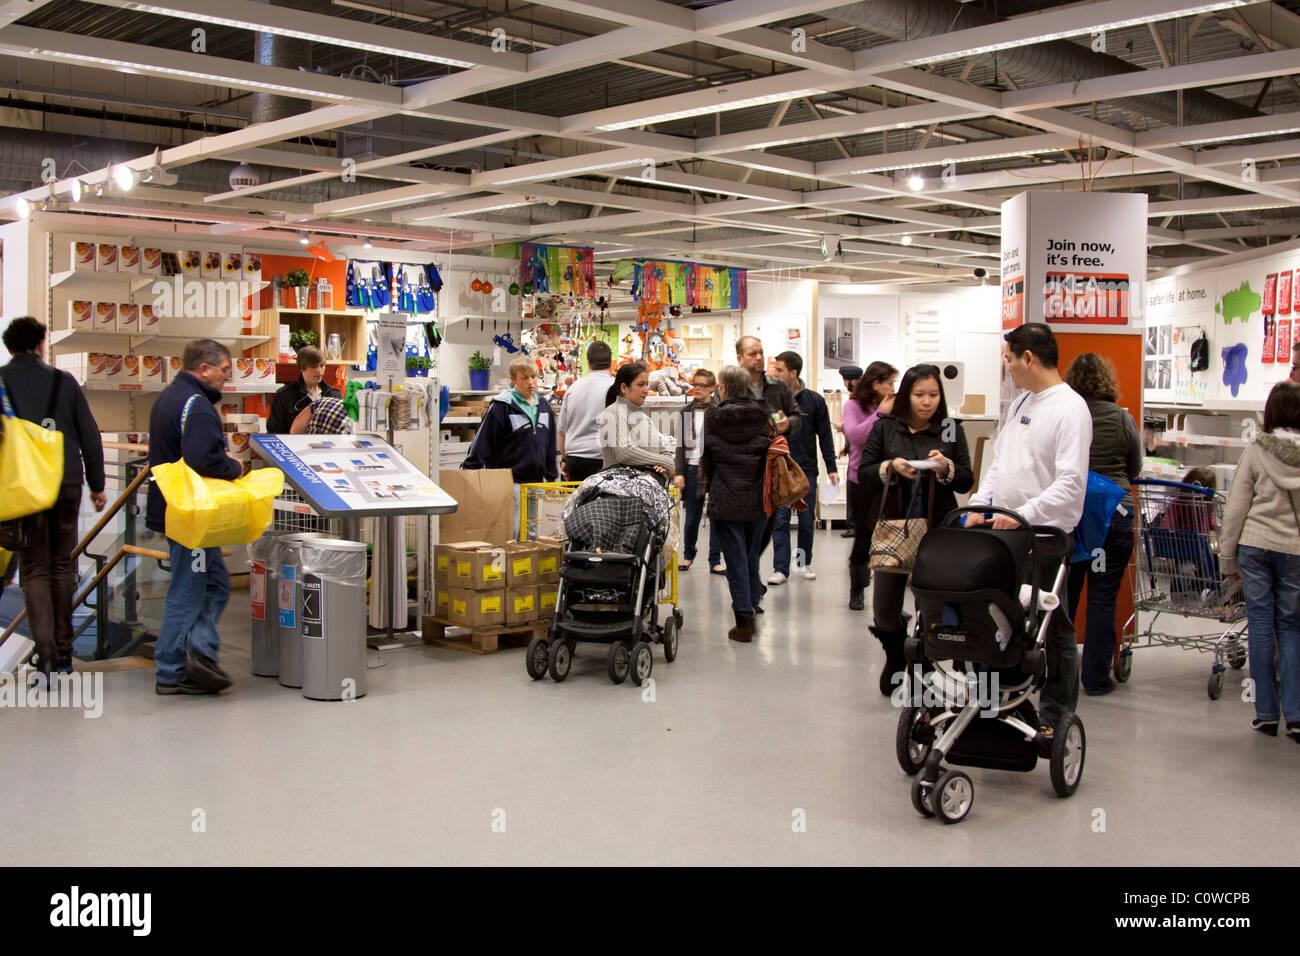 Ikea Store   Wembley   London